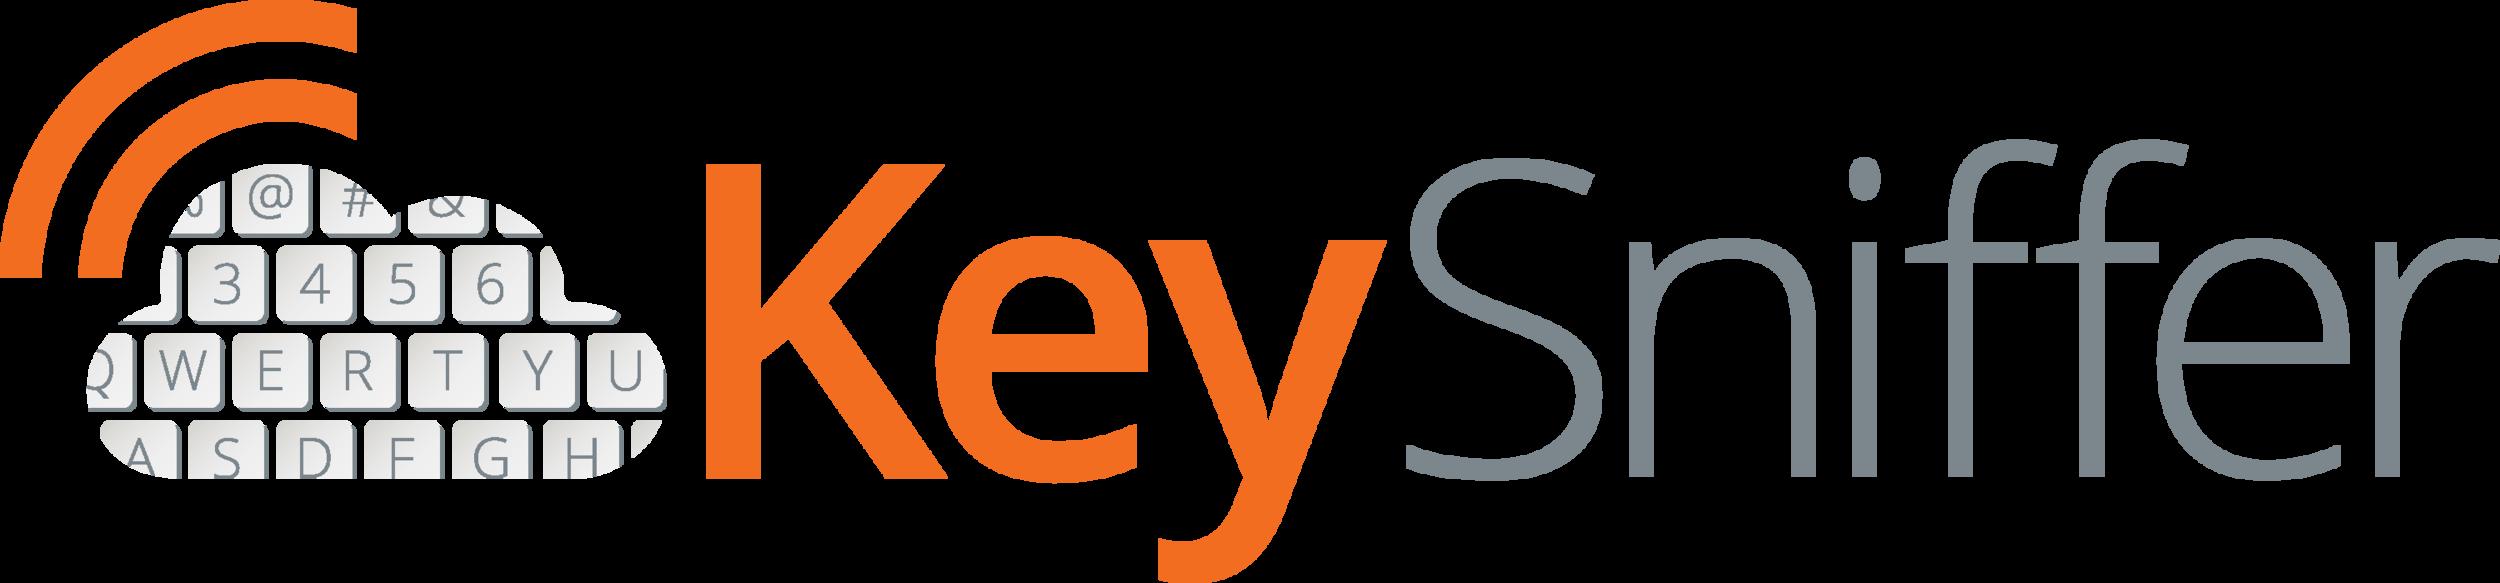 KeySniffer logo transparent